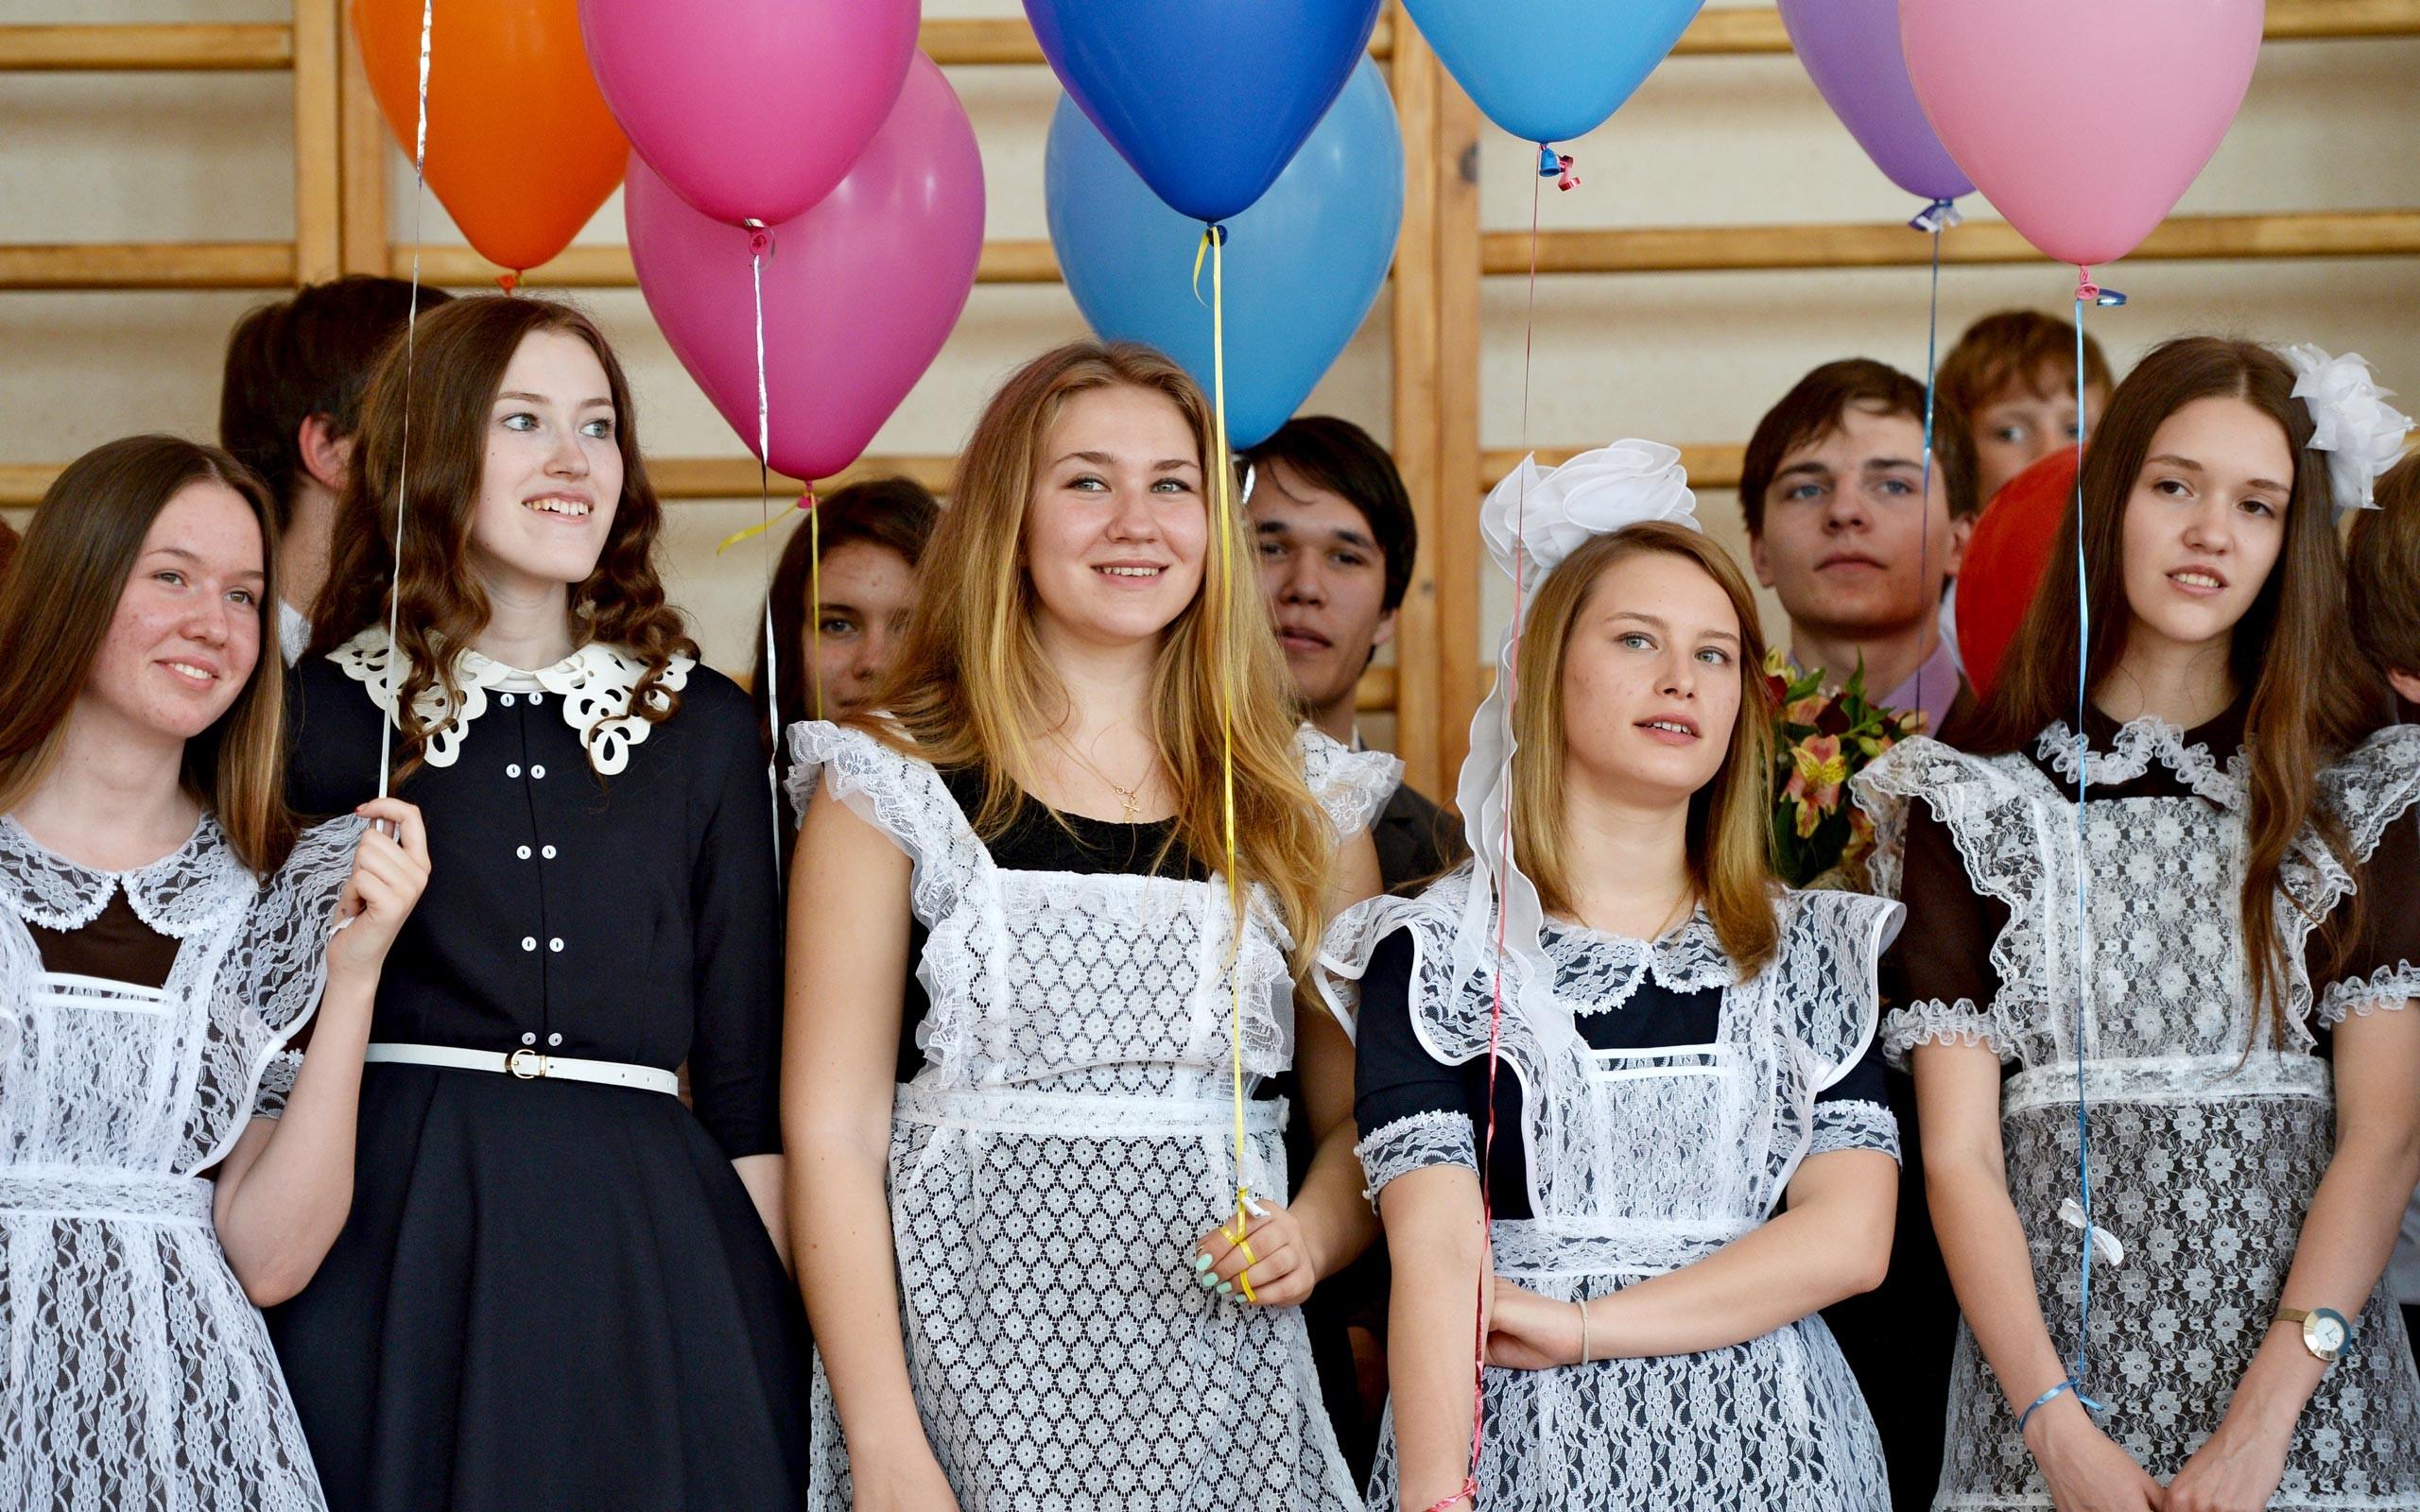 <p>Фото: &copy; РИА Новости/<span>Павел Лисицын</span></p>